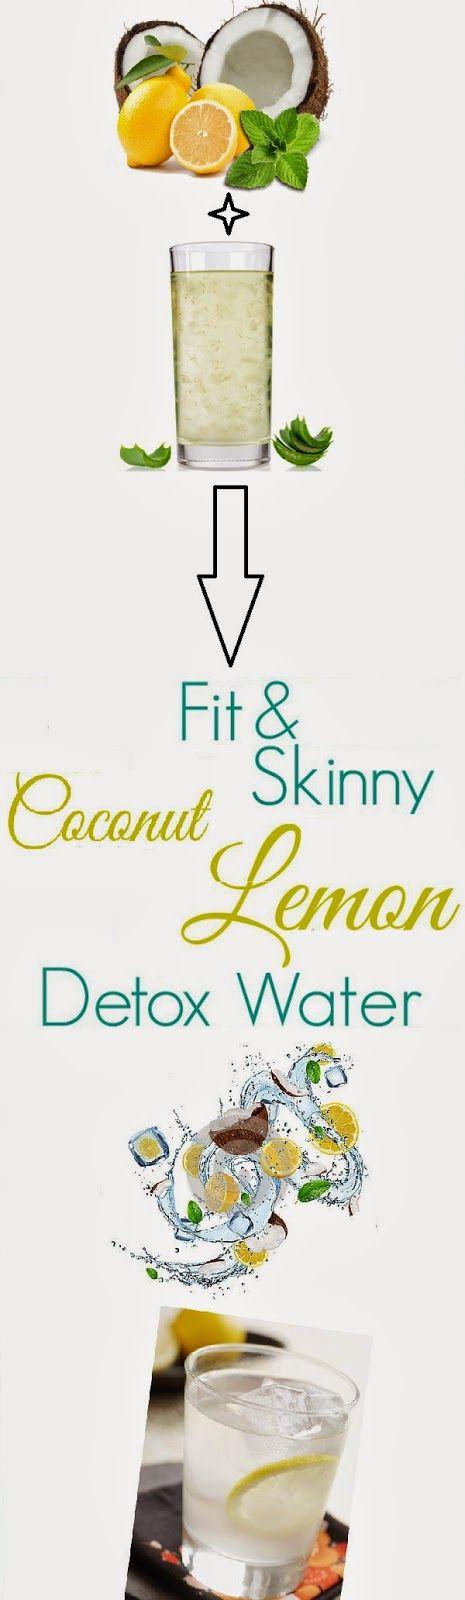 Skin Care And Health Tips: Fit & Skinny Coconut Lemon Detox Water Recipe